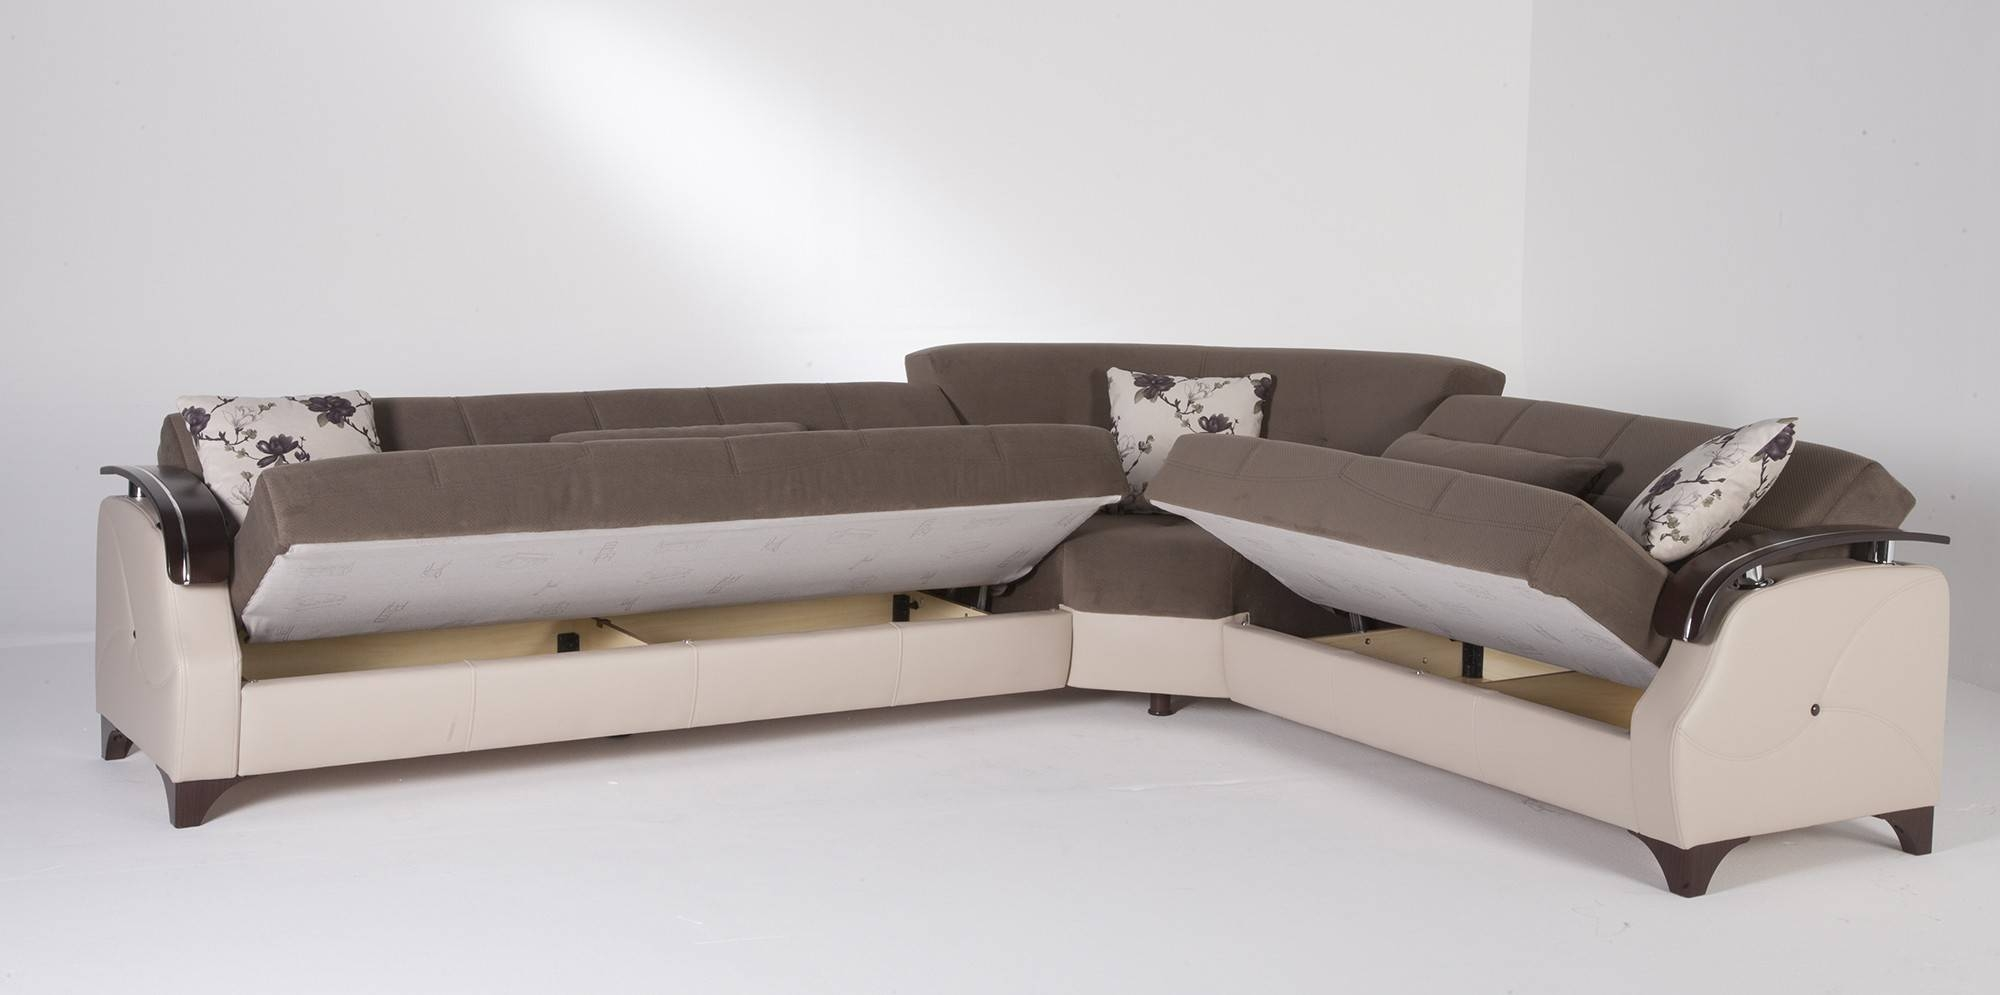 Kobe Sectional Sofa Sleeper - S3Net - Sectional Sofas Sale : S3Net intended for Sleeper Sectional Sofas (Image 9 of 30)